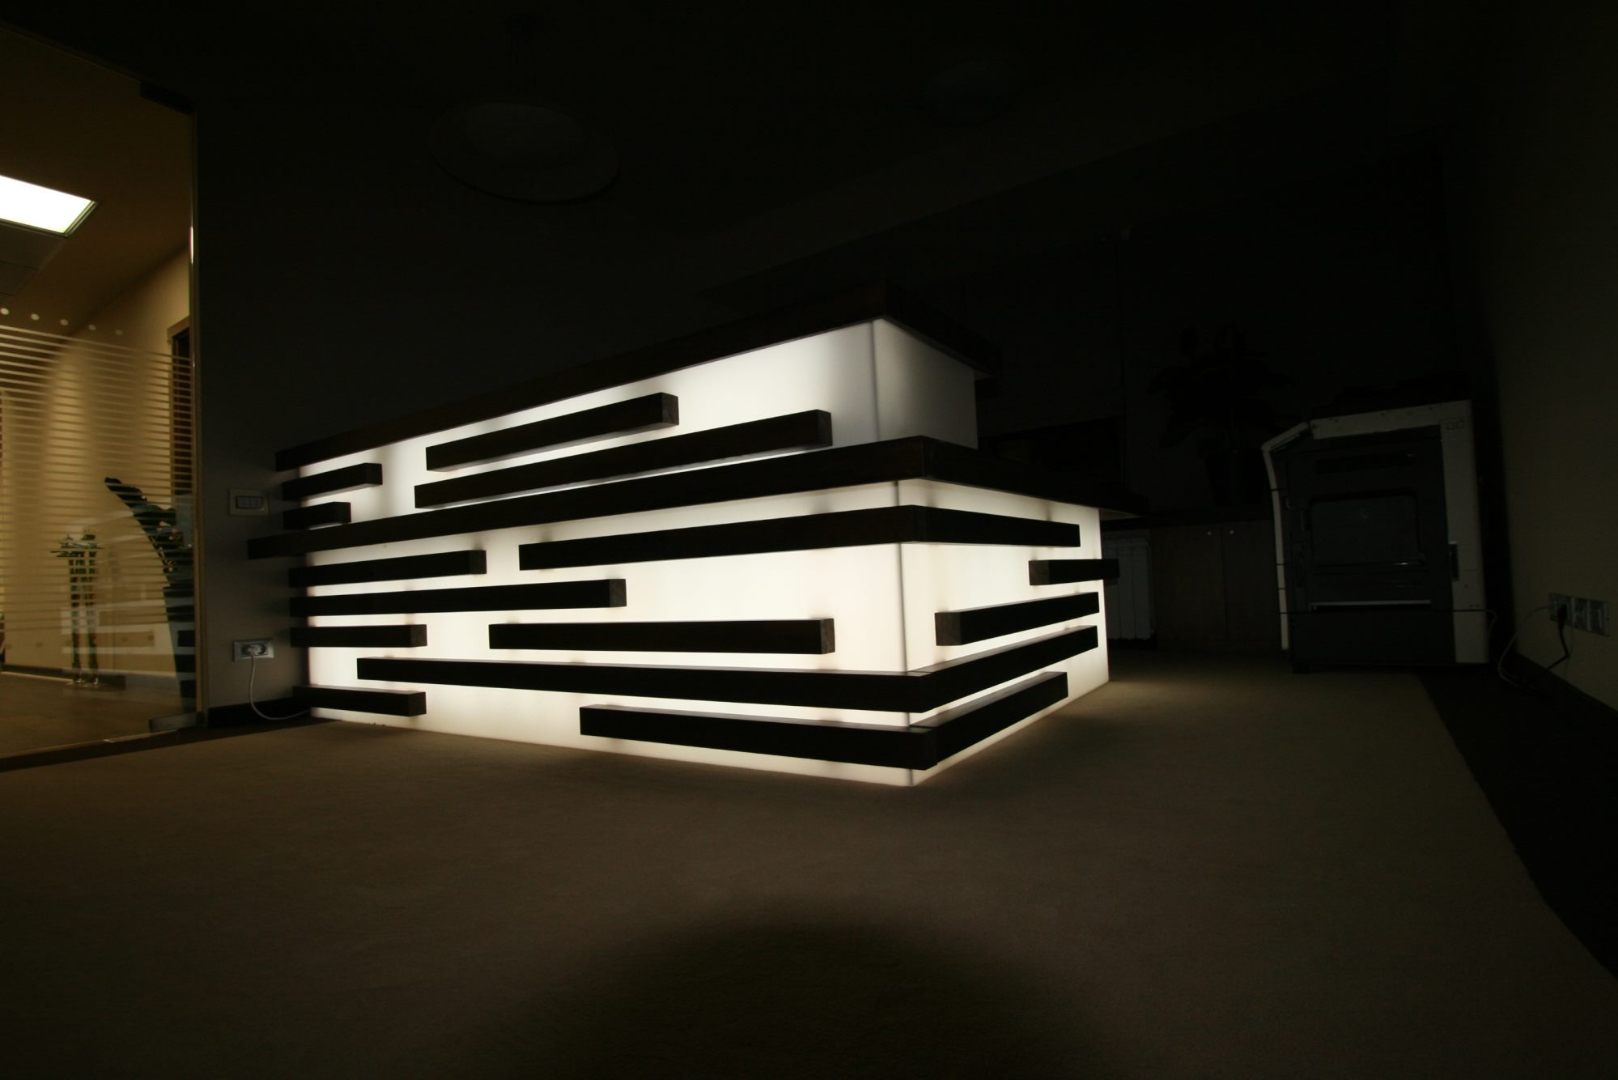 placari pereti corian iluminat led receptie corian termoformat furnir tavan furnir nuc tridimensional mobilier trafoare atipic depa005